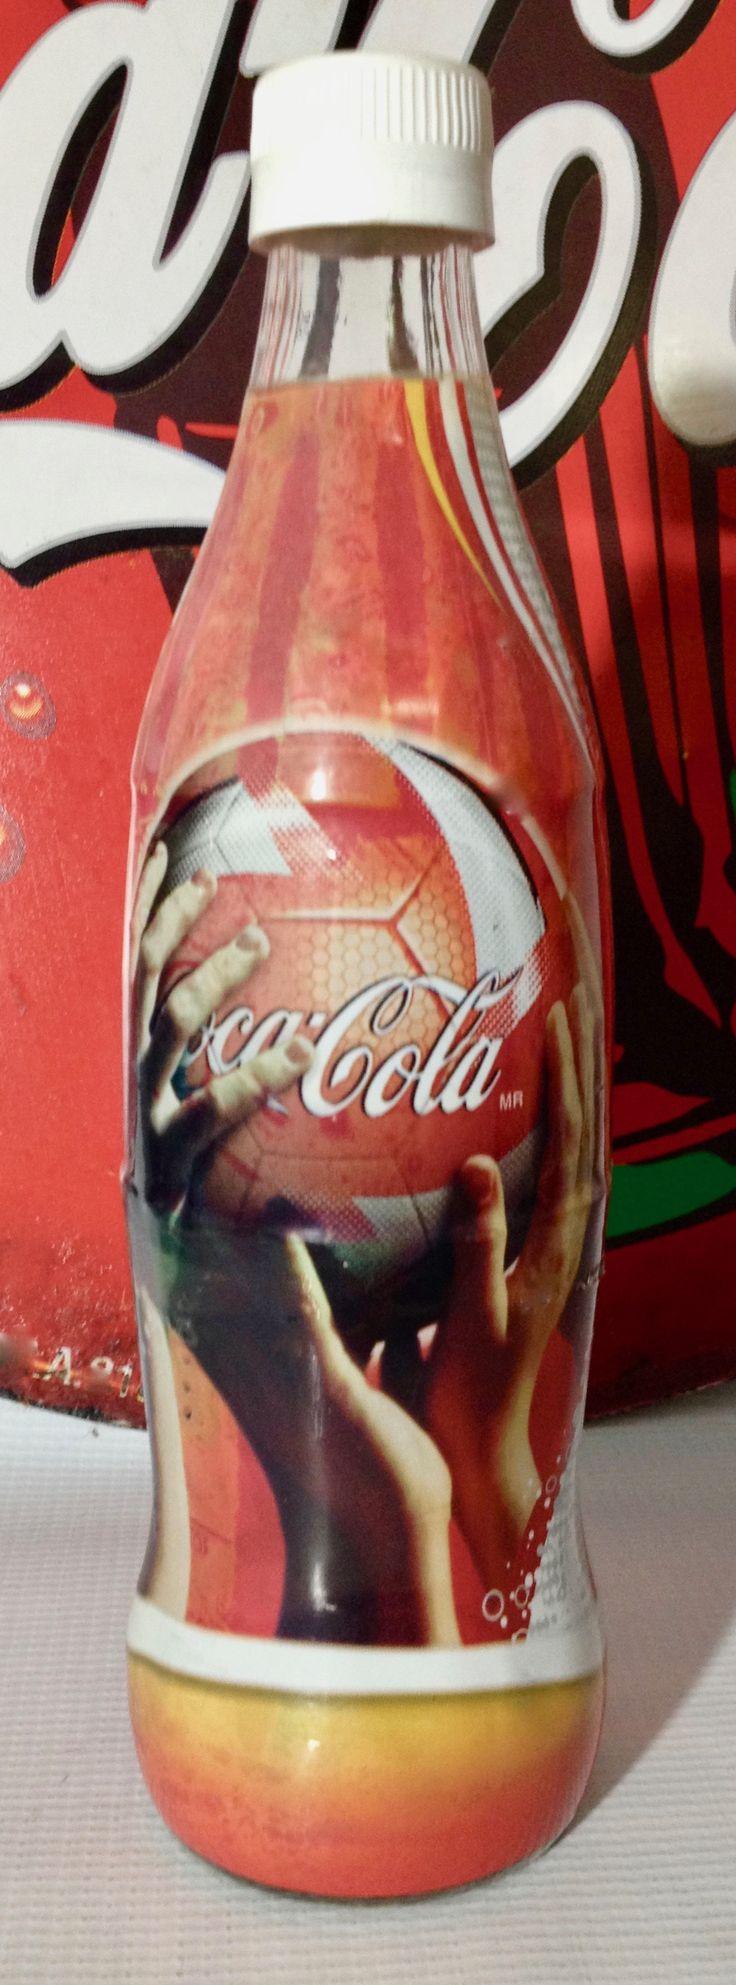 copa uruguaya coca cola Coca Cola México 2003, Copa America.